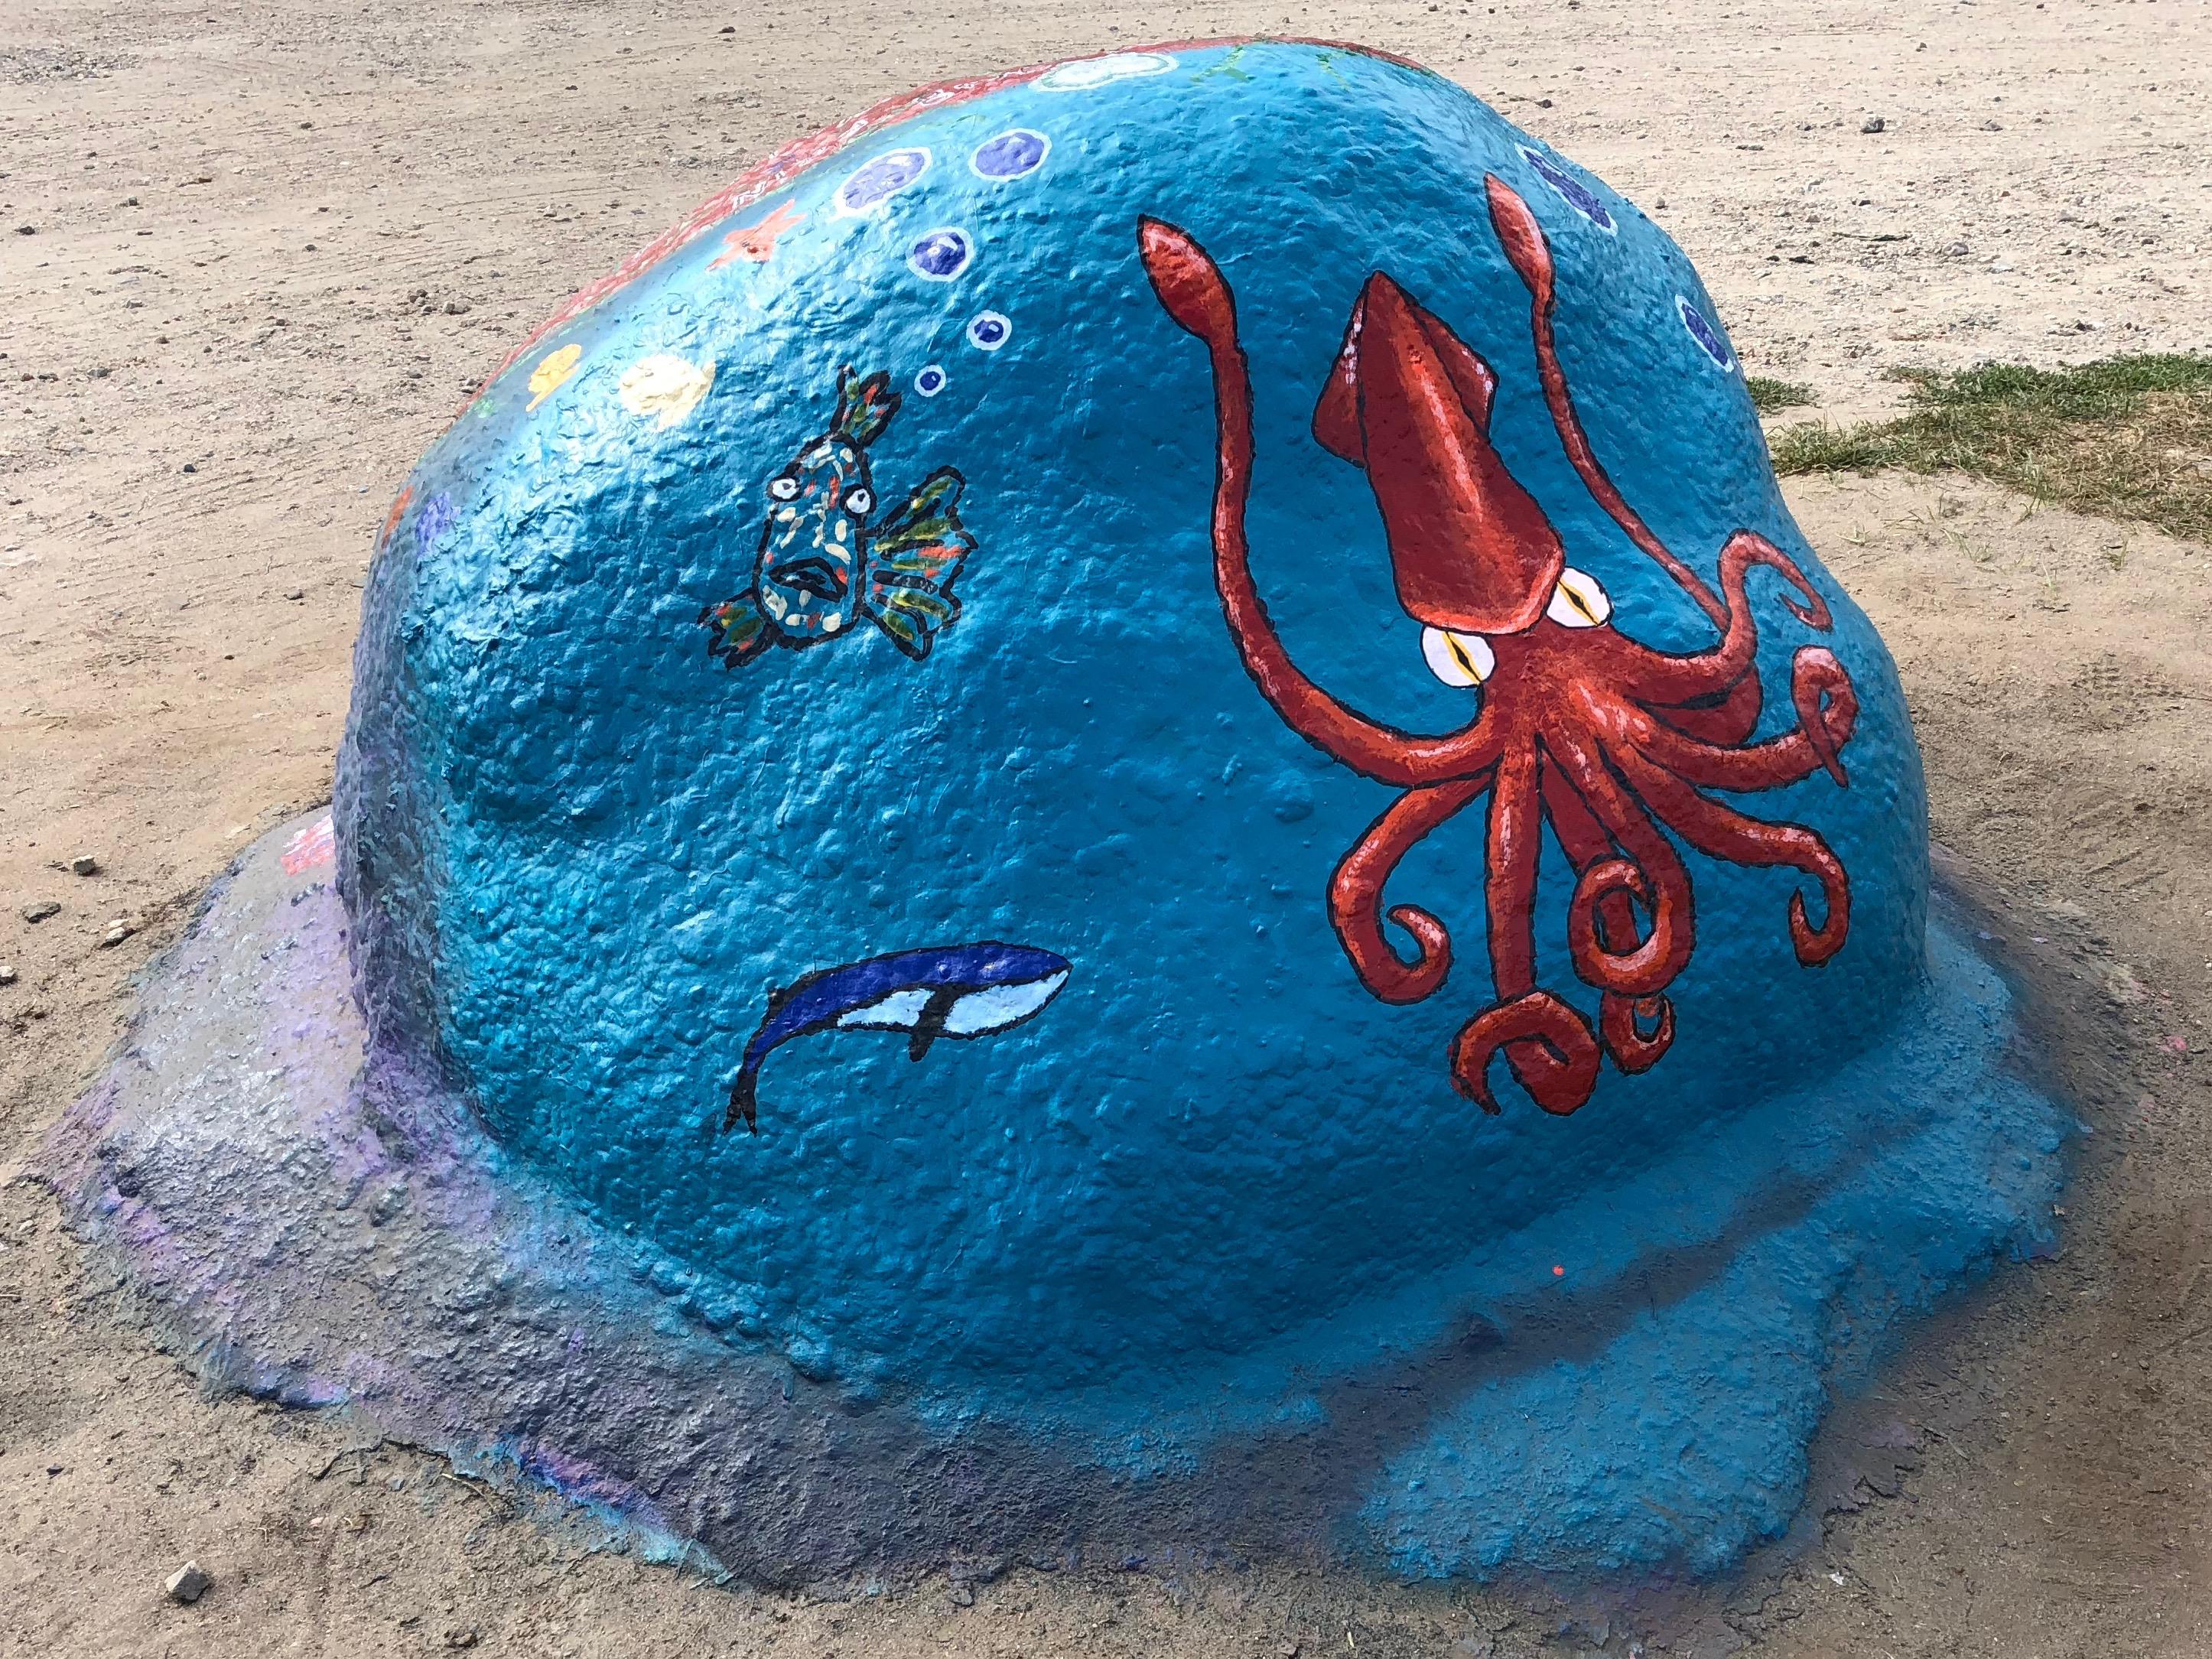 083118-octopus-best-Painted-Rock-2018